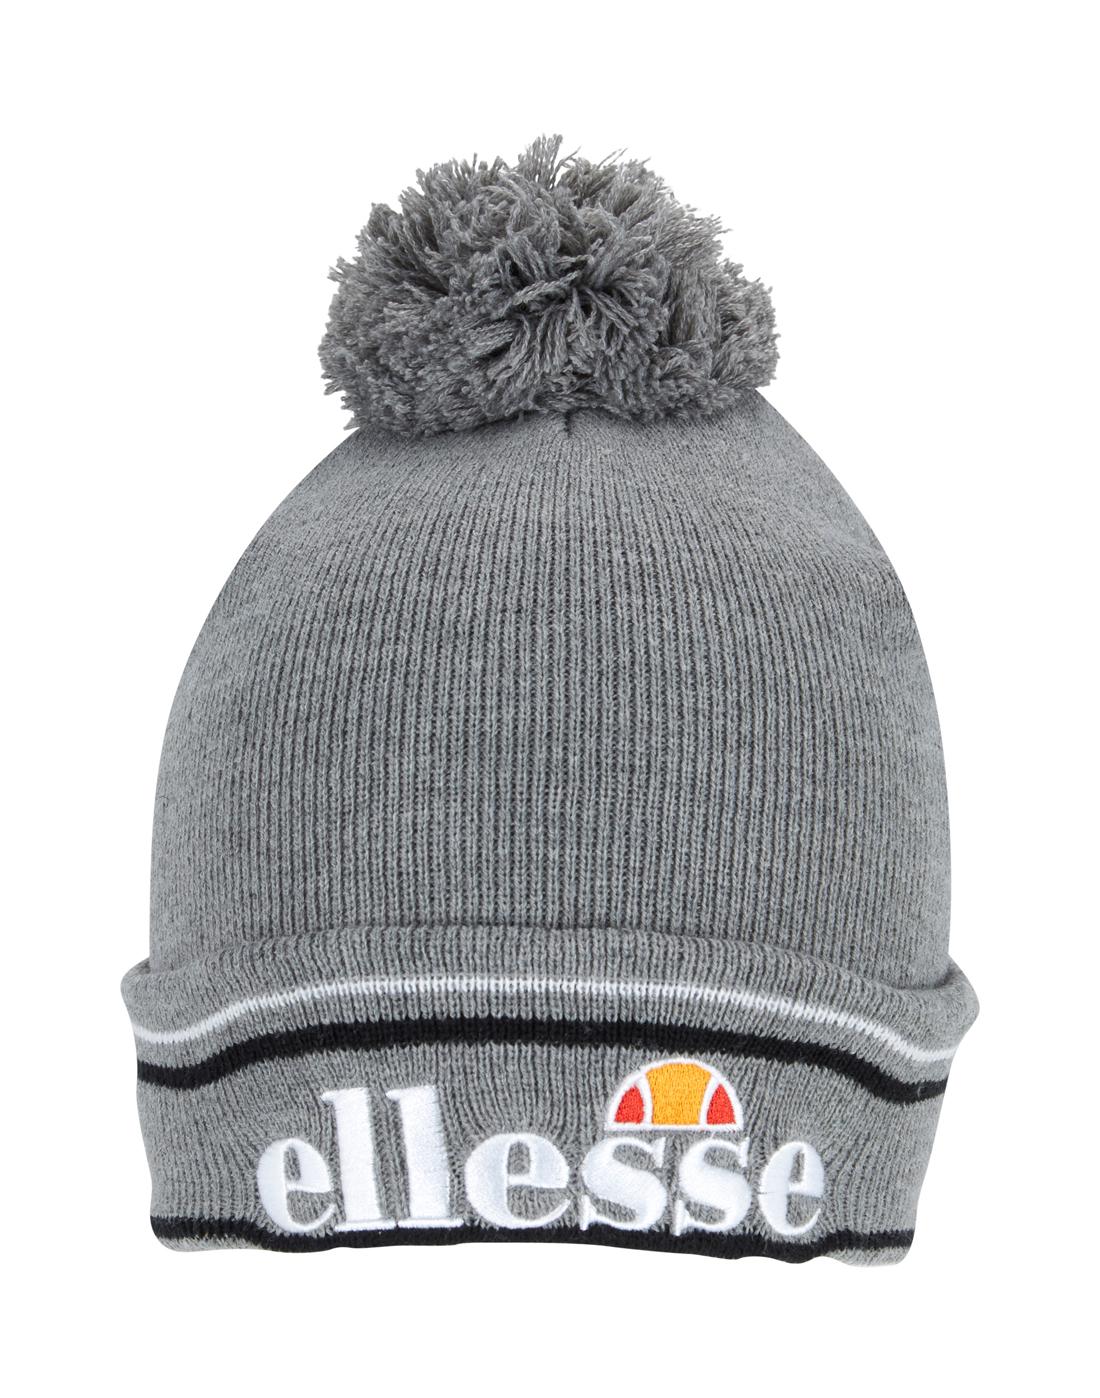 437545a21212ea Ellesse Monza Beanie | Life Style Sports